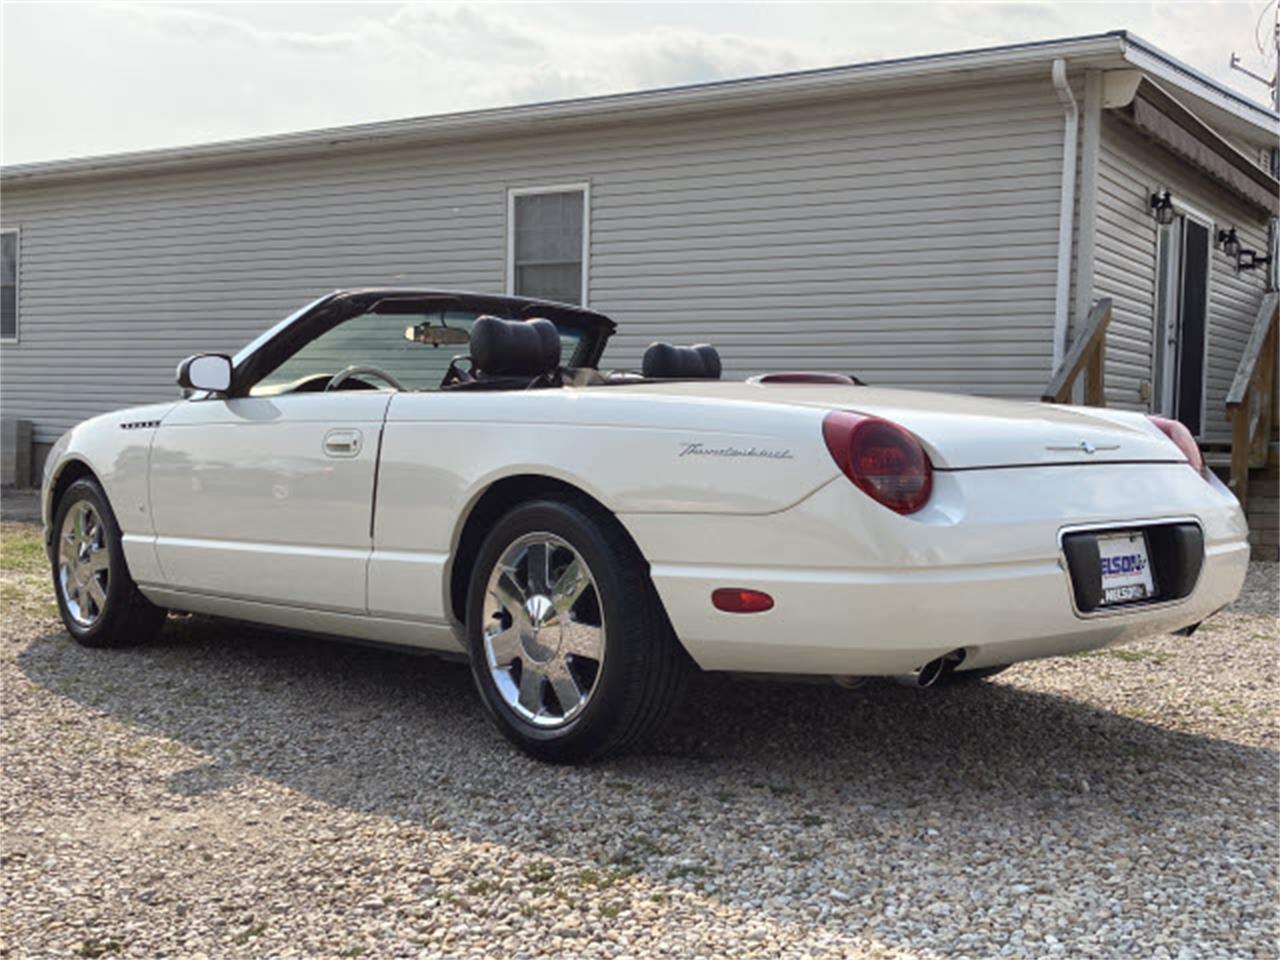 2003 Ford Thunderbird (CC-1385334) for sale in Marysville, Ohio